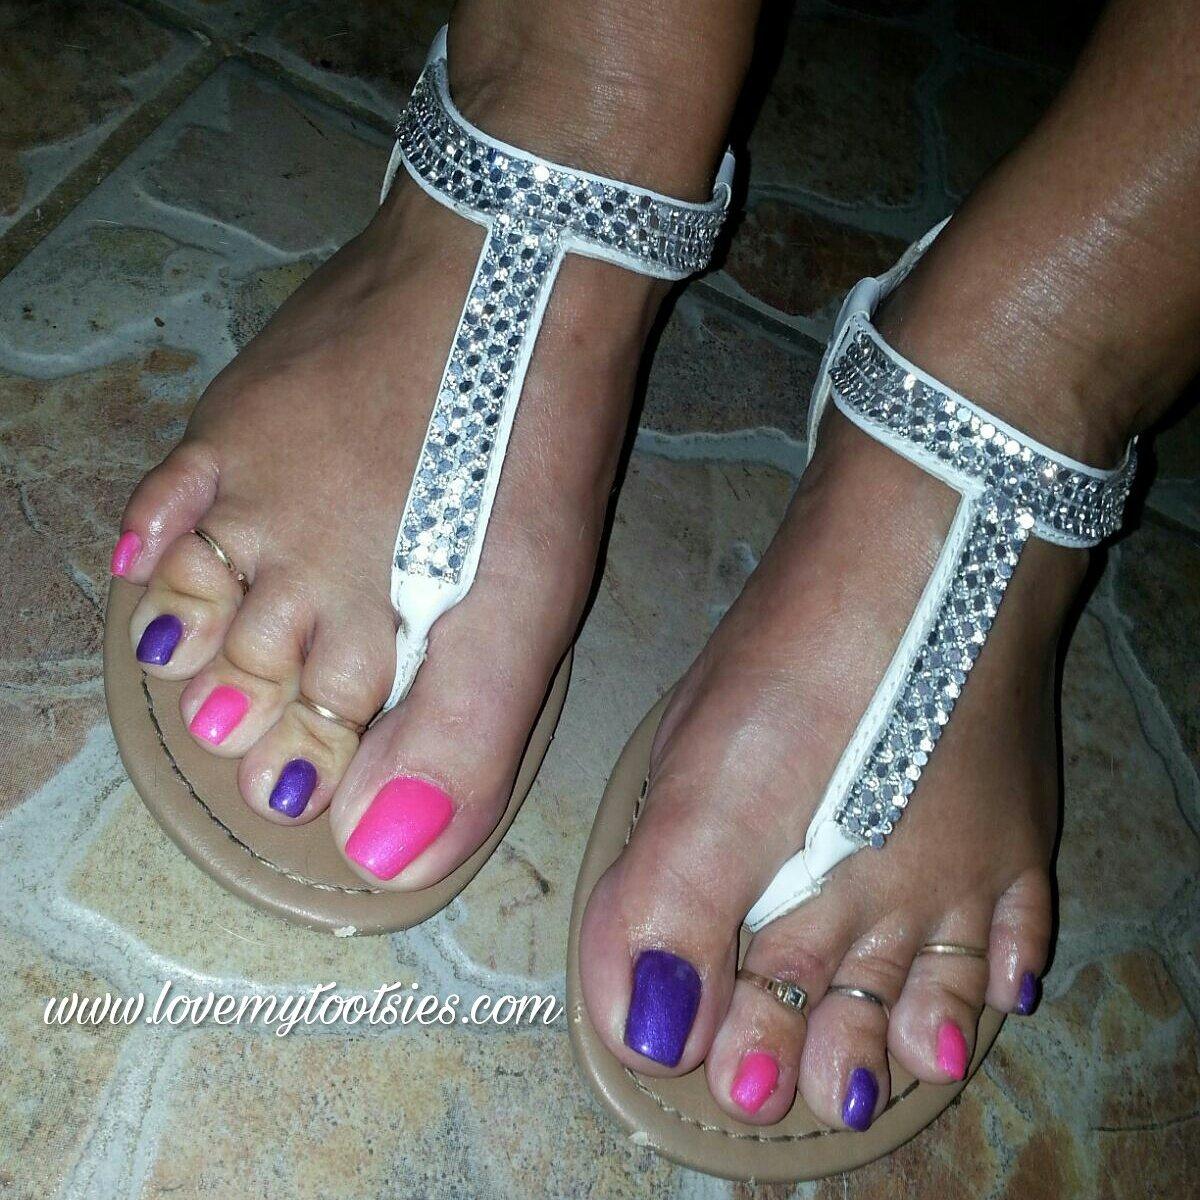 Fresh #pedicure 😆 #softsoles #footmodel #vafeet #vafootbabe #sexyfeet #feetworld #footfetishnation #maturefeet #teamprettyfeet #footporn https://t.co/NgsUsbxO8r